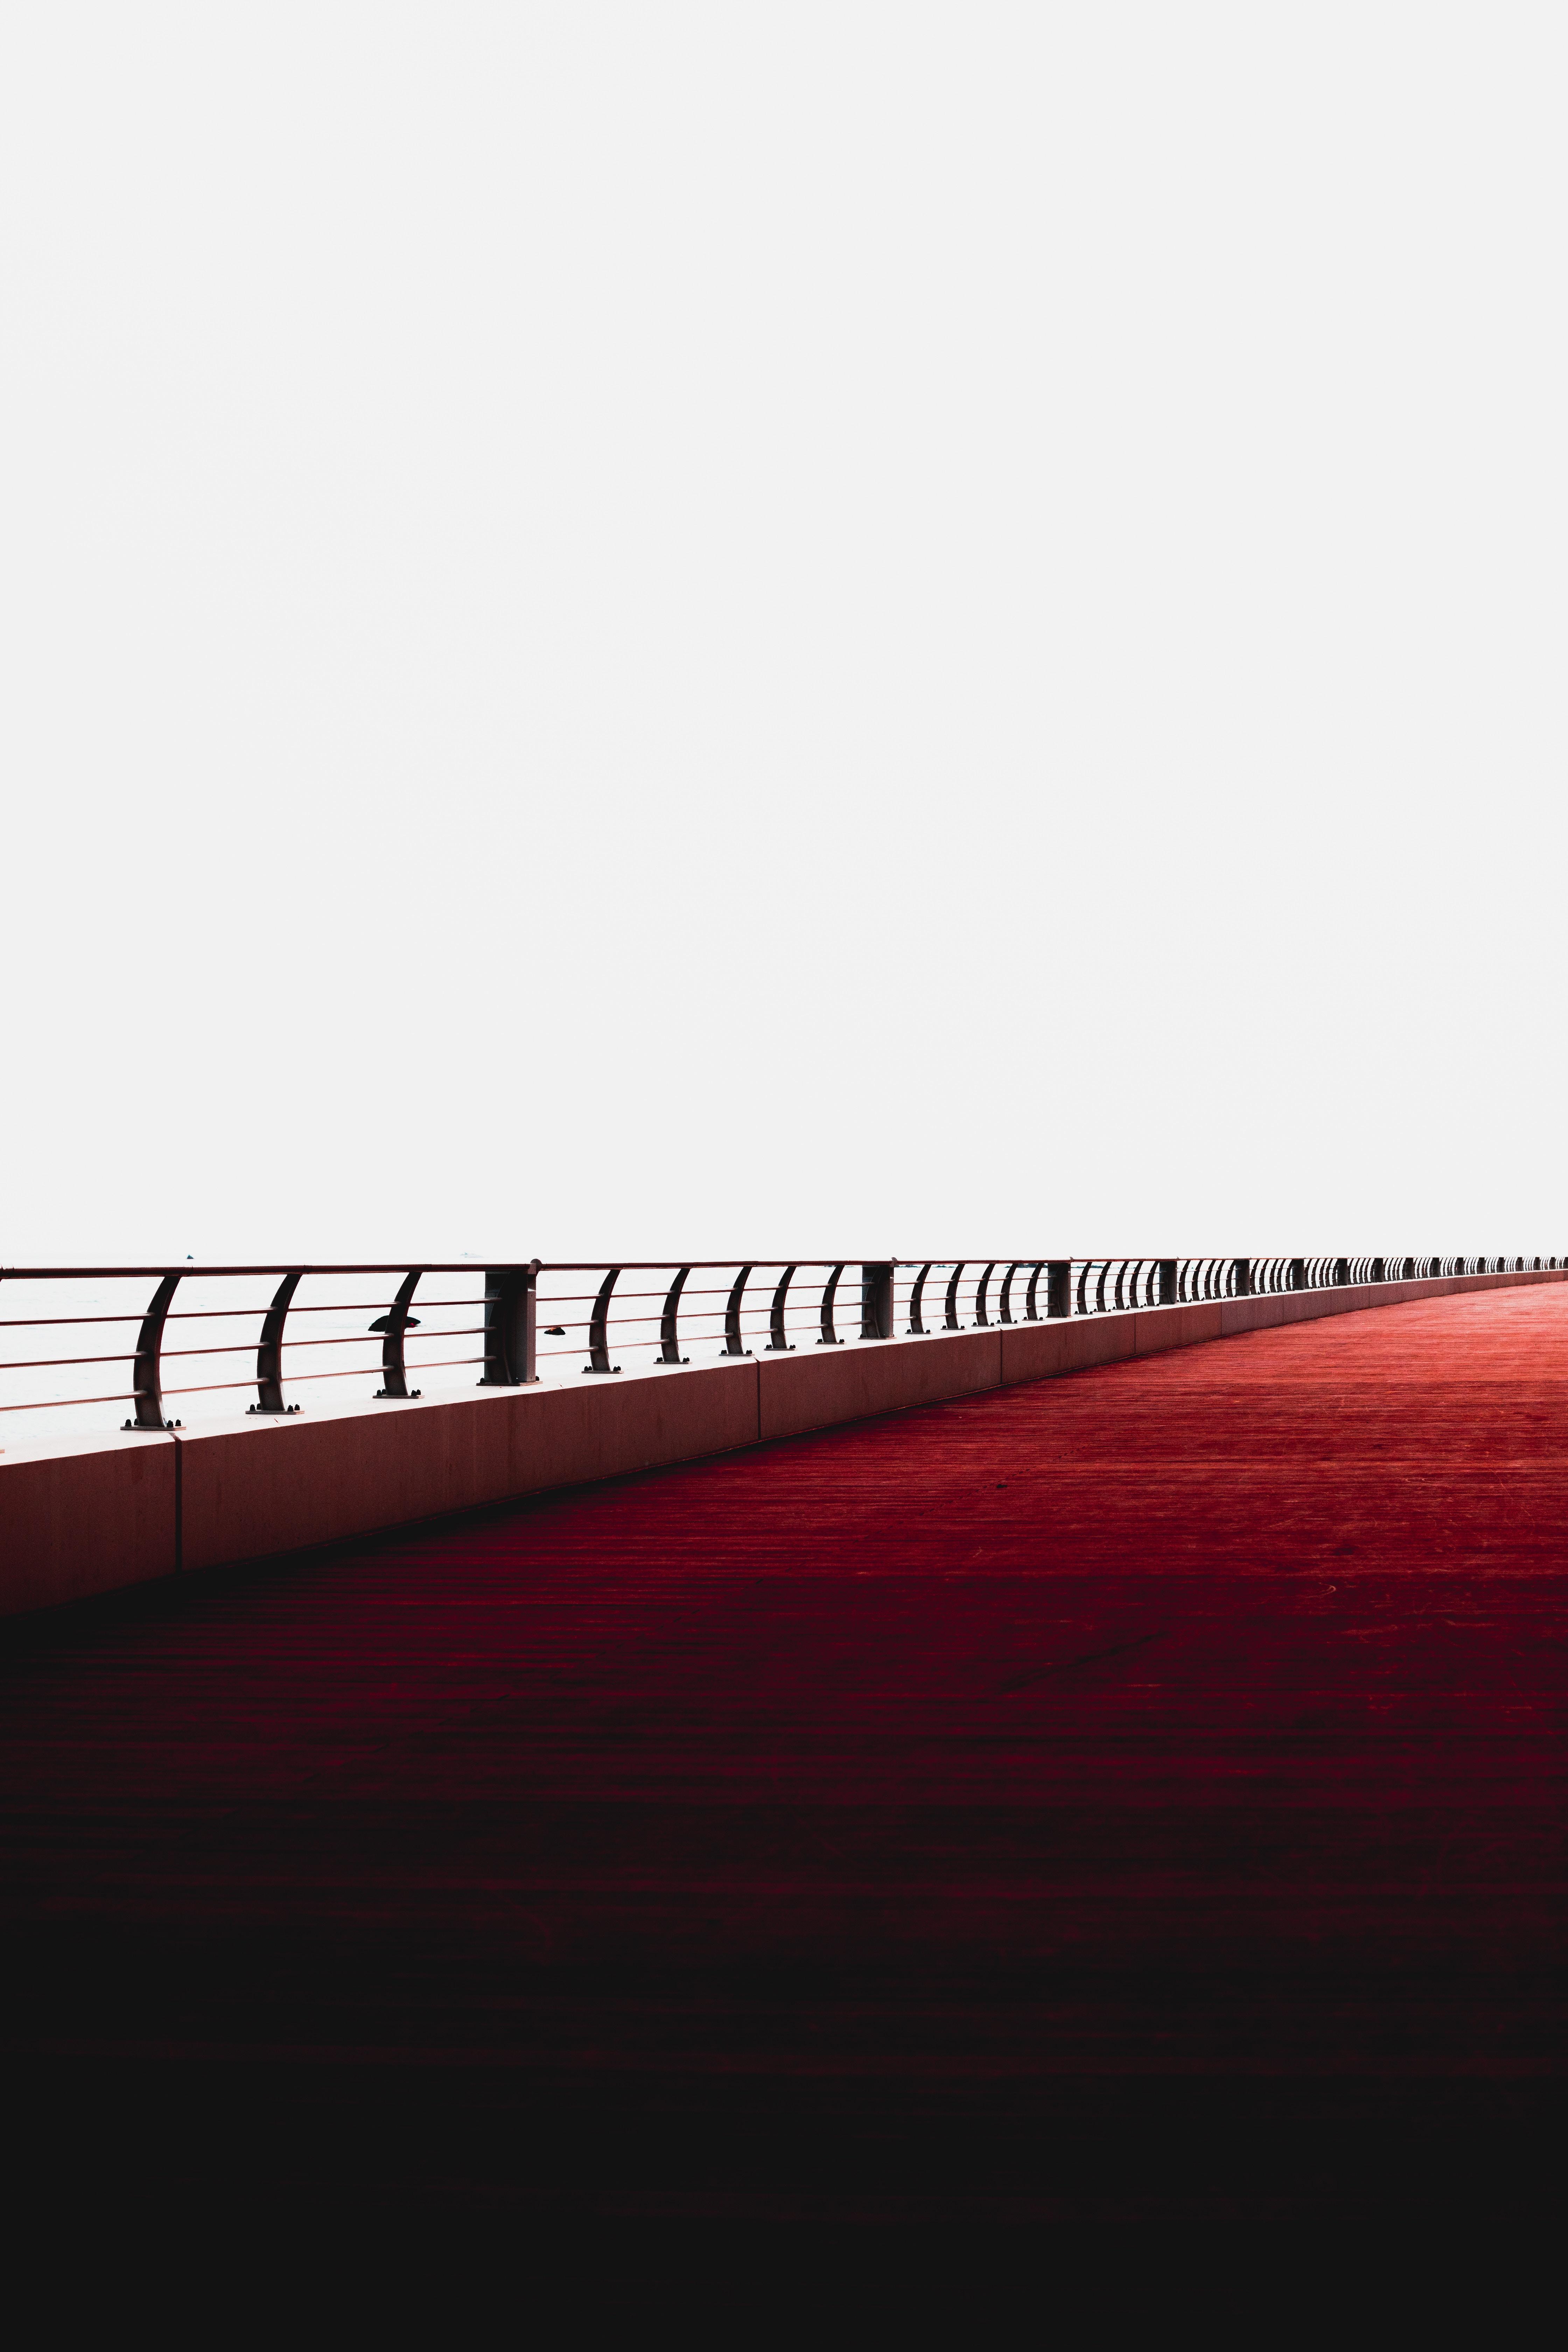 91269 Screensavers and Wallpapers Bridge for phone. Download Minimalism, Dubai, Bridge, Railings, Handrail, United Arab Emirates pictures for free